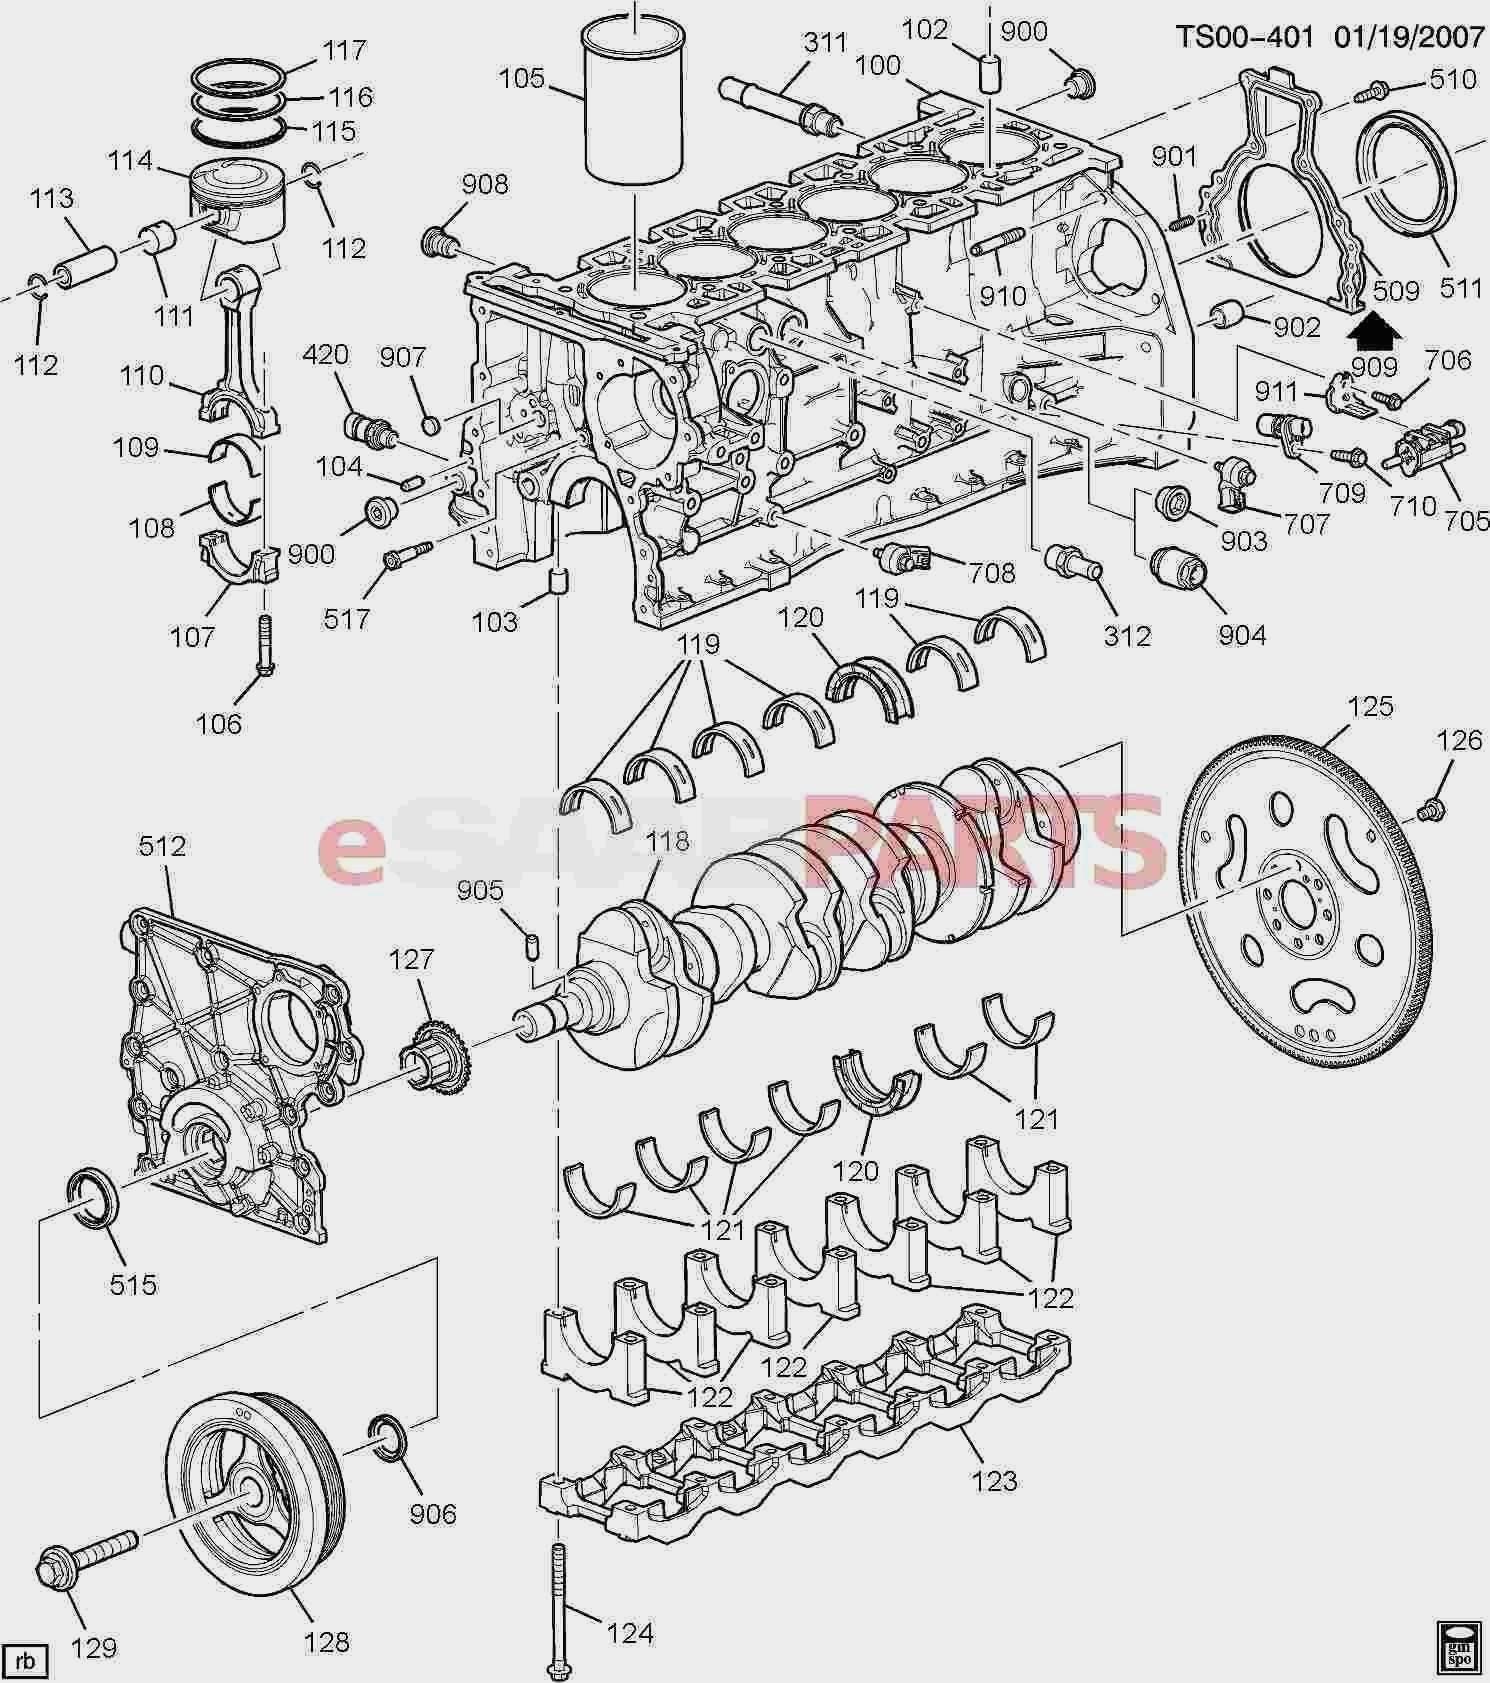 Diagram Of Engine Parts Saab Usa Parts Of Diagram Of Engine Parts